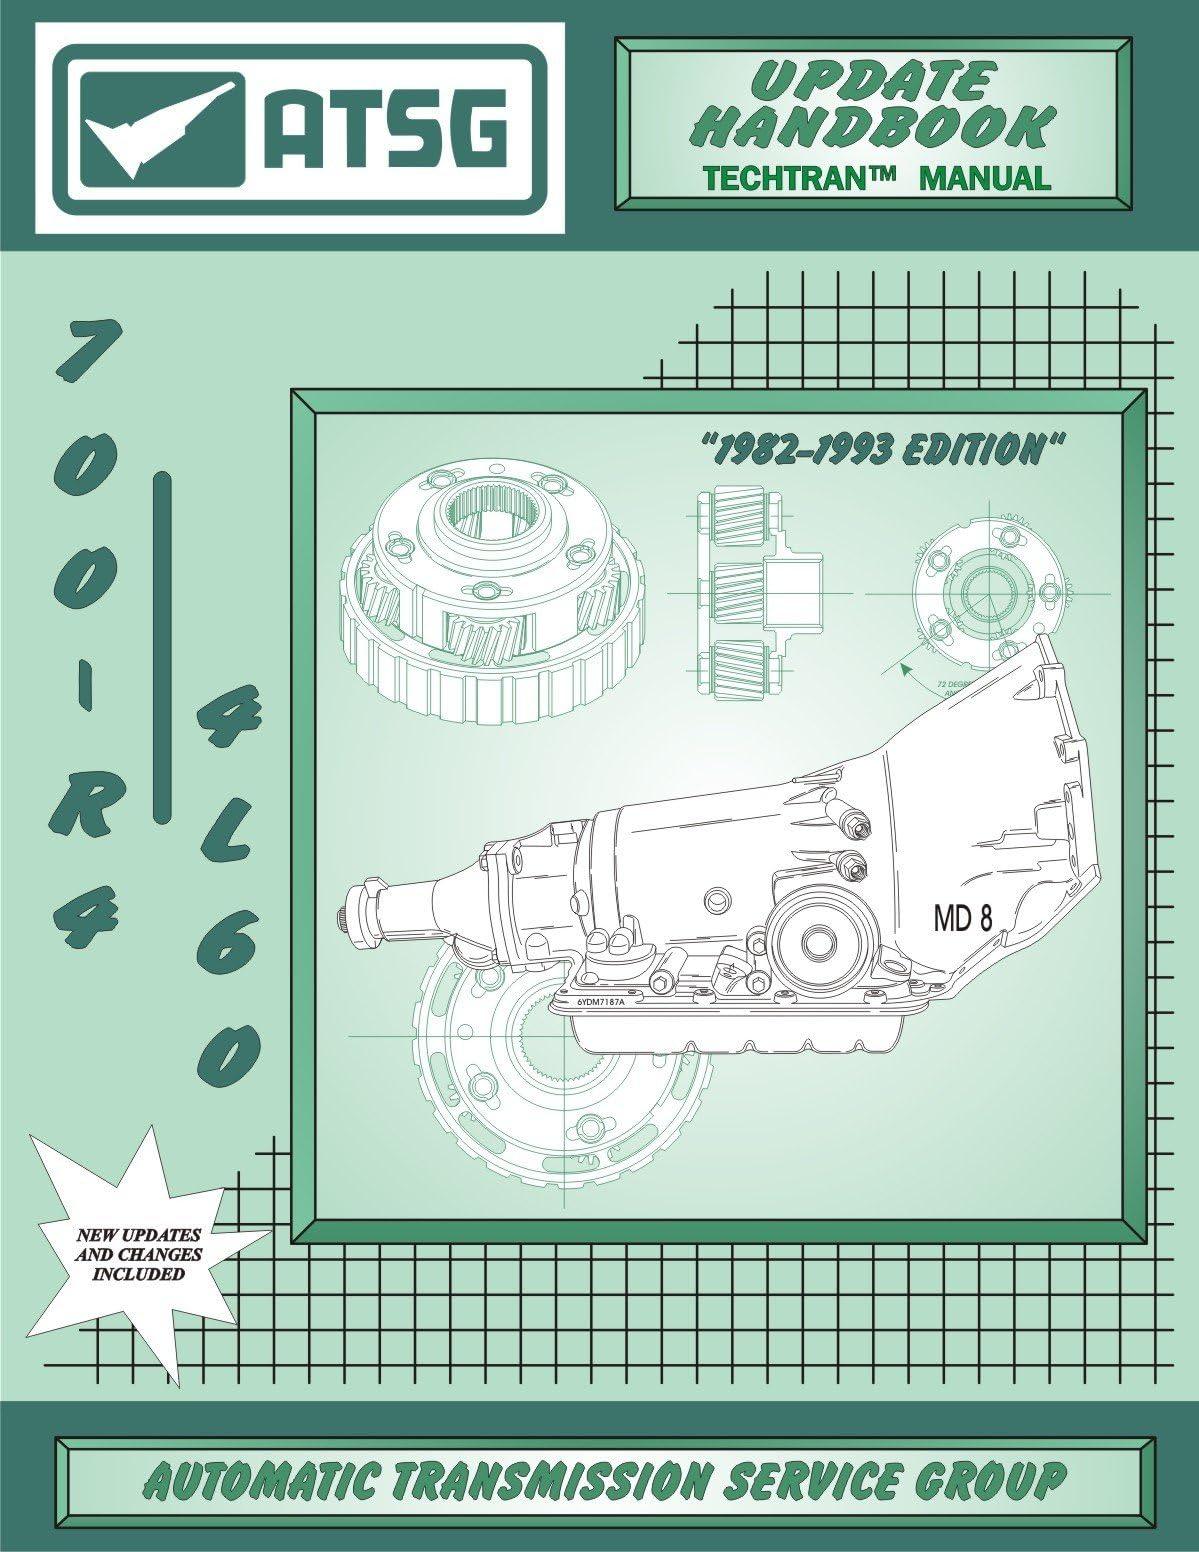 amazon com rebuild kits transmissions \u0026 parts automotive GM TH350 Spedometer atsg 700 r4 update handbook gm transmission repair manual (700r4 transmission rebuild kit 700r4